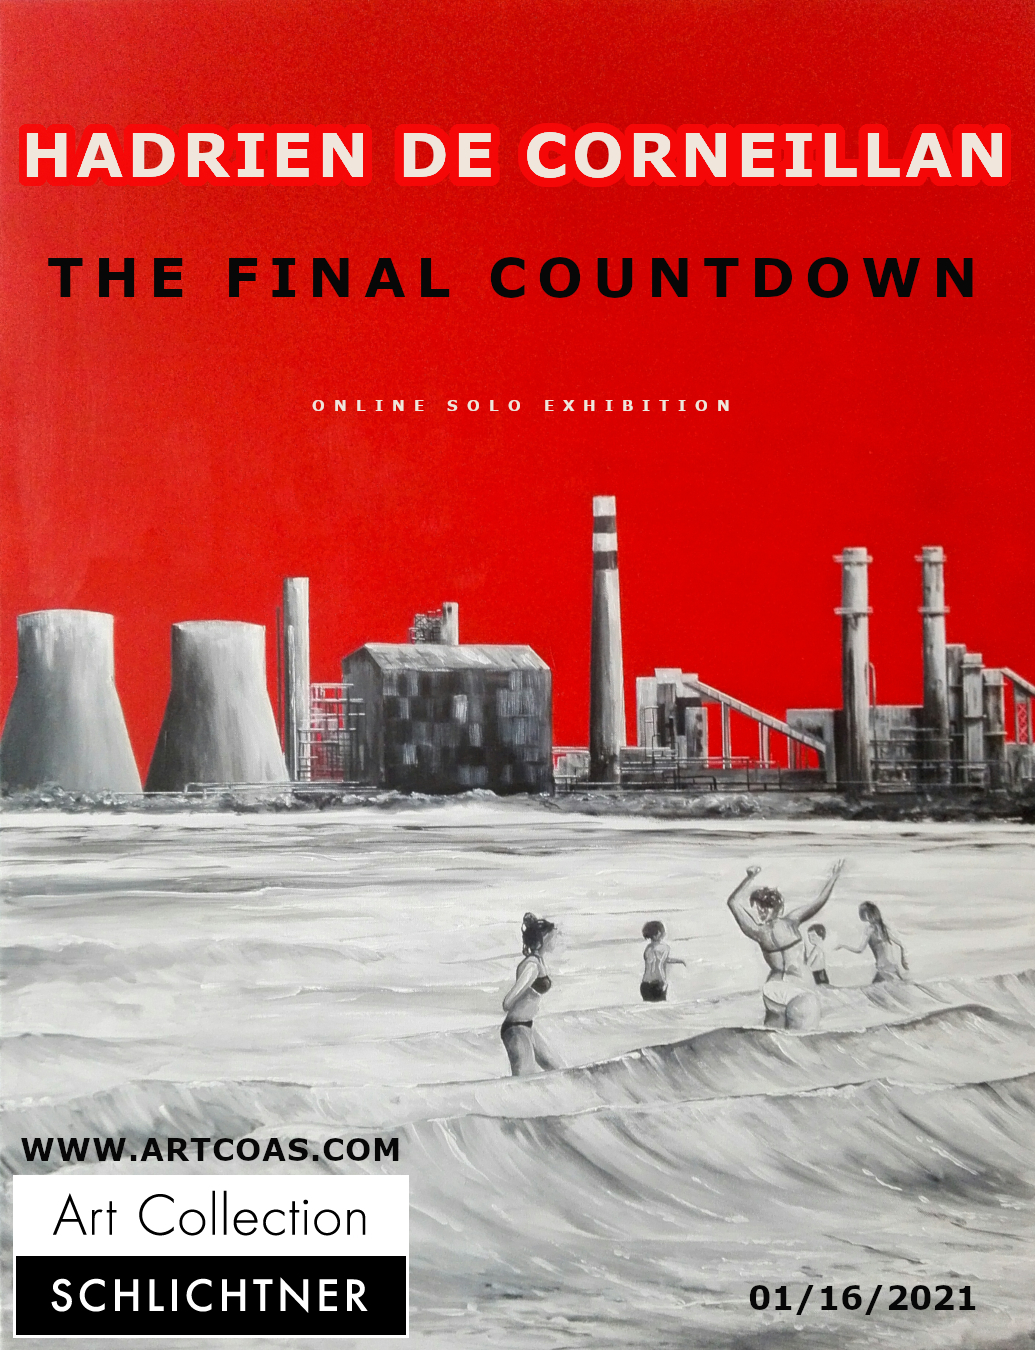 Hadrien de Corneillan - The final countdown - online solo exhibition